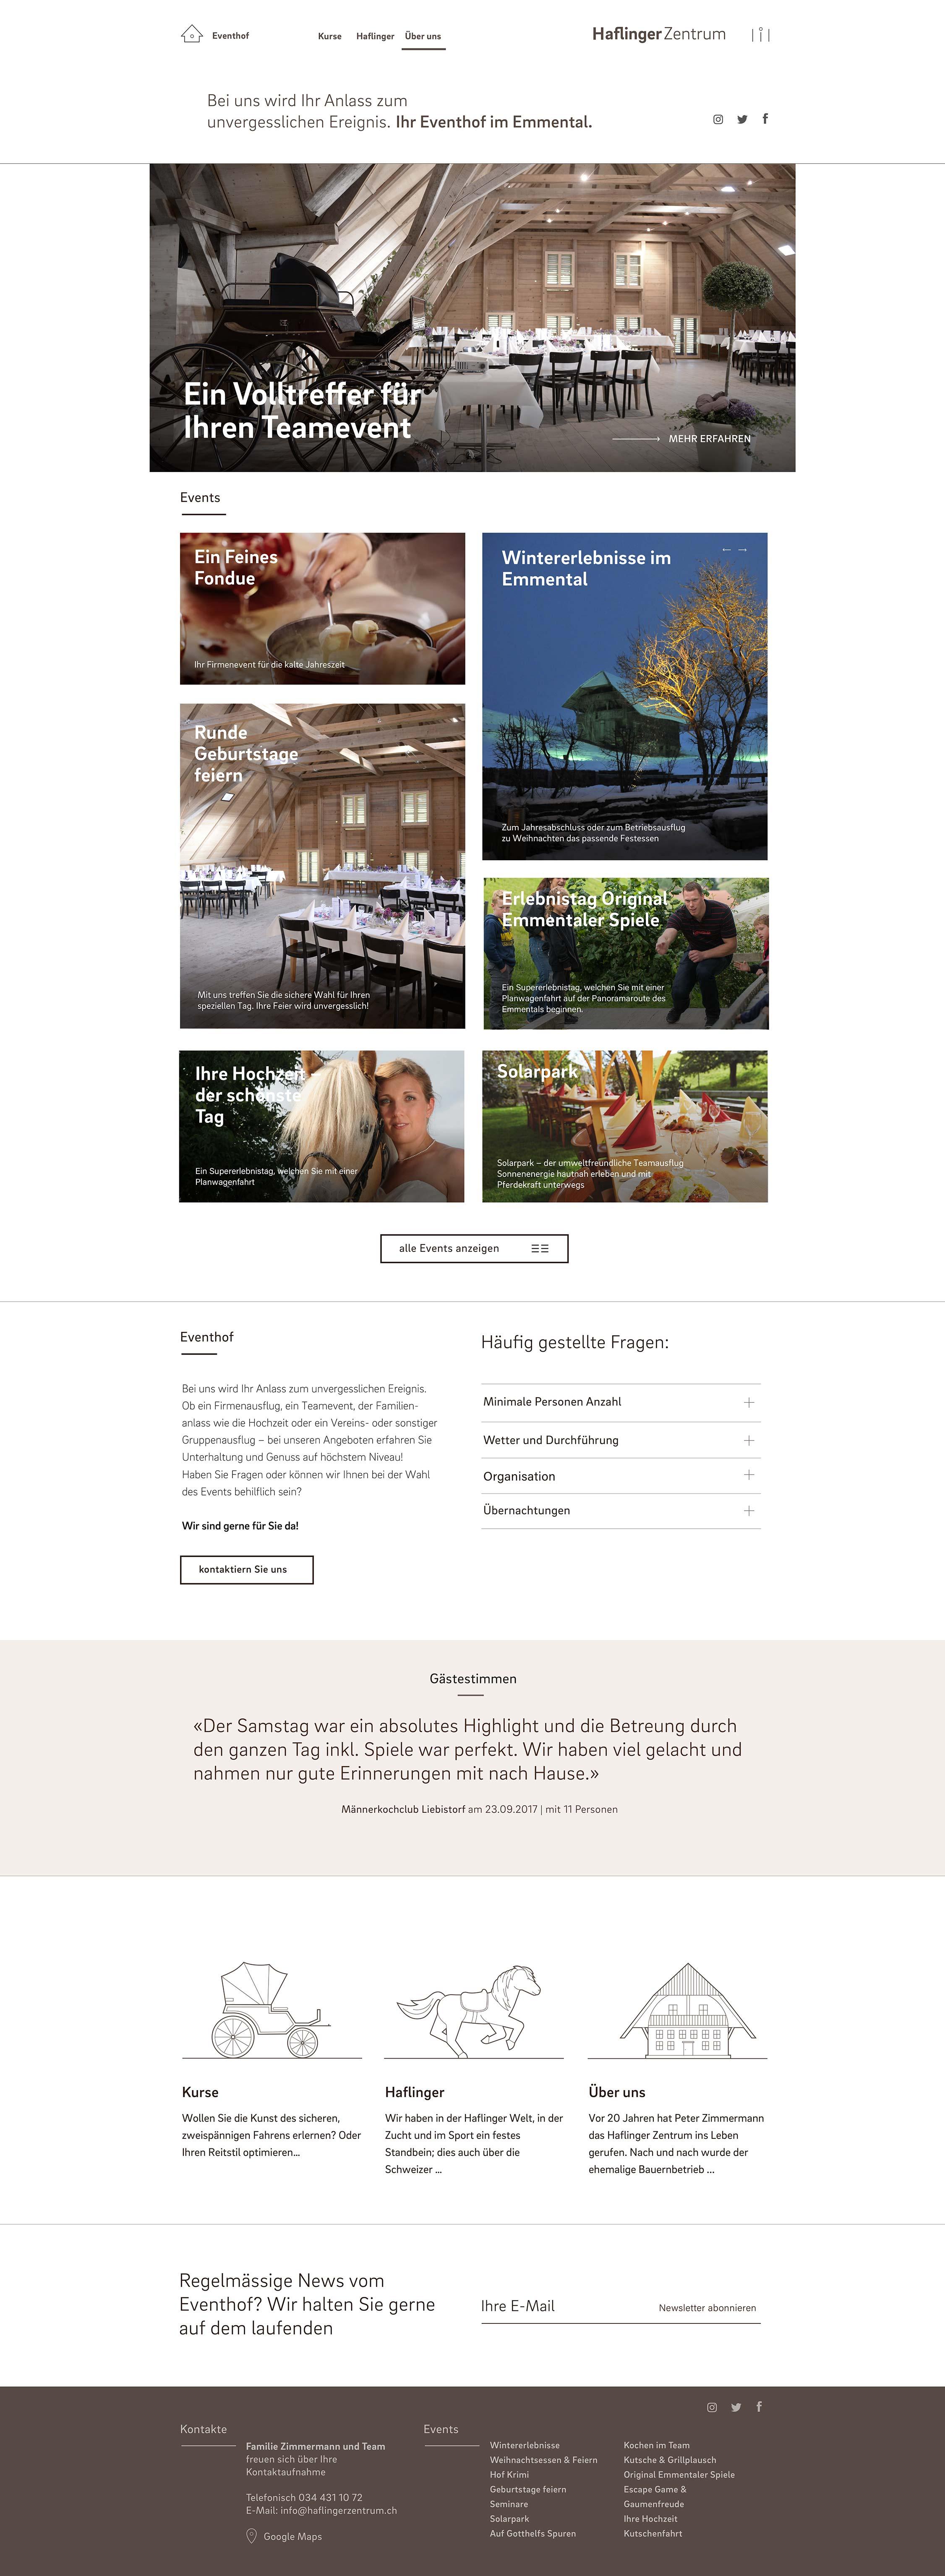 Haflinger Zentrum Digital Website Ueber uns Desktop